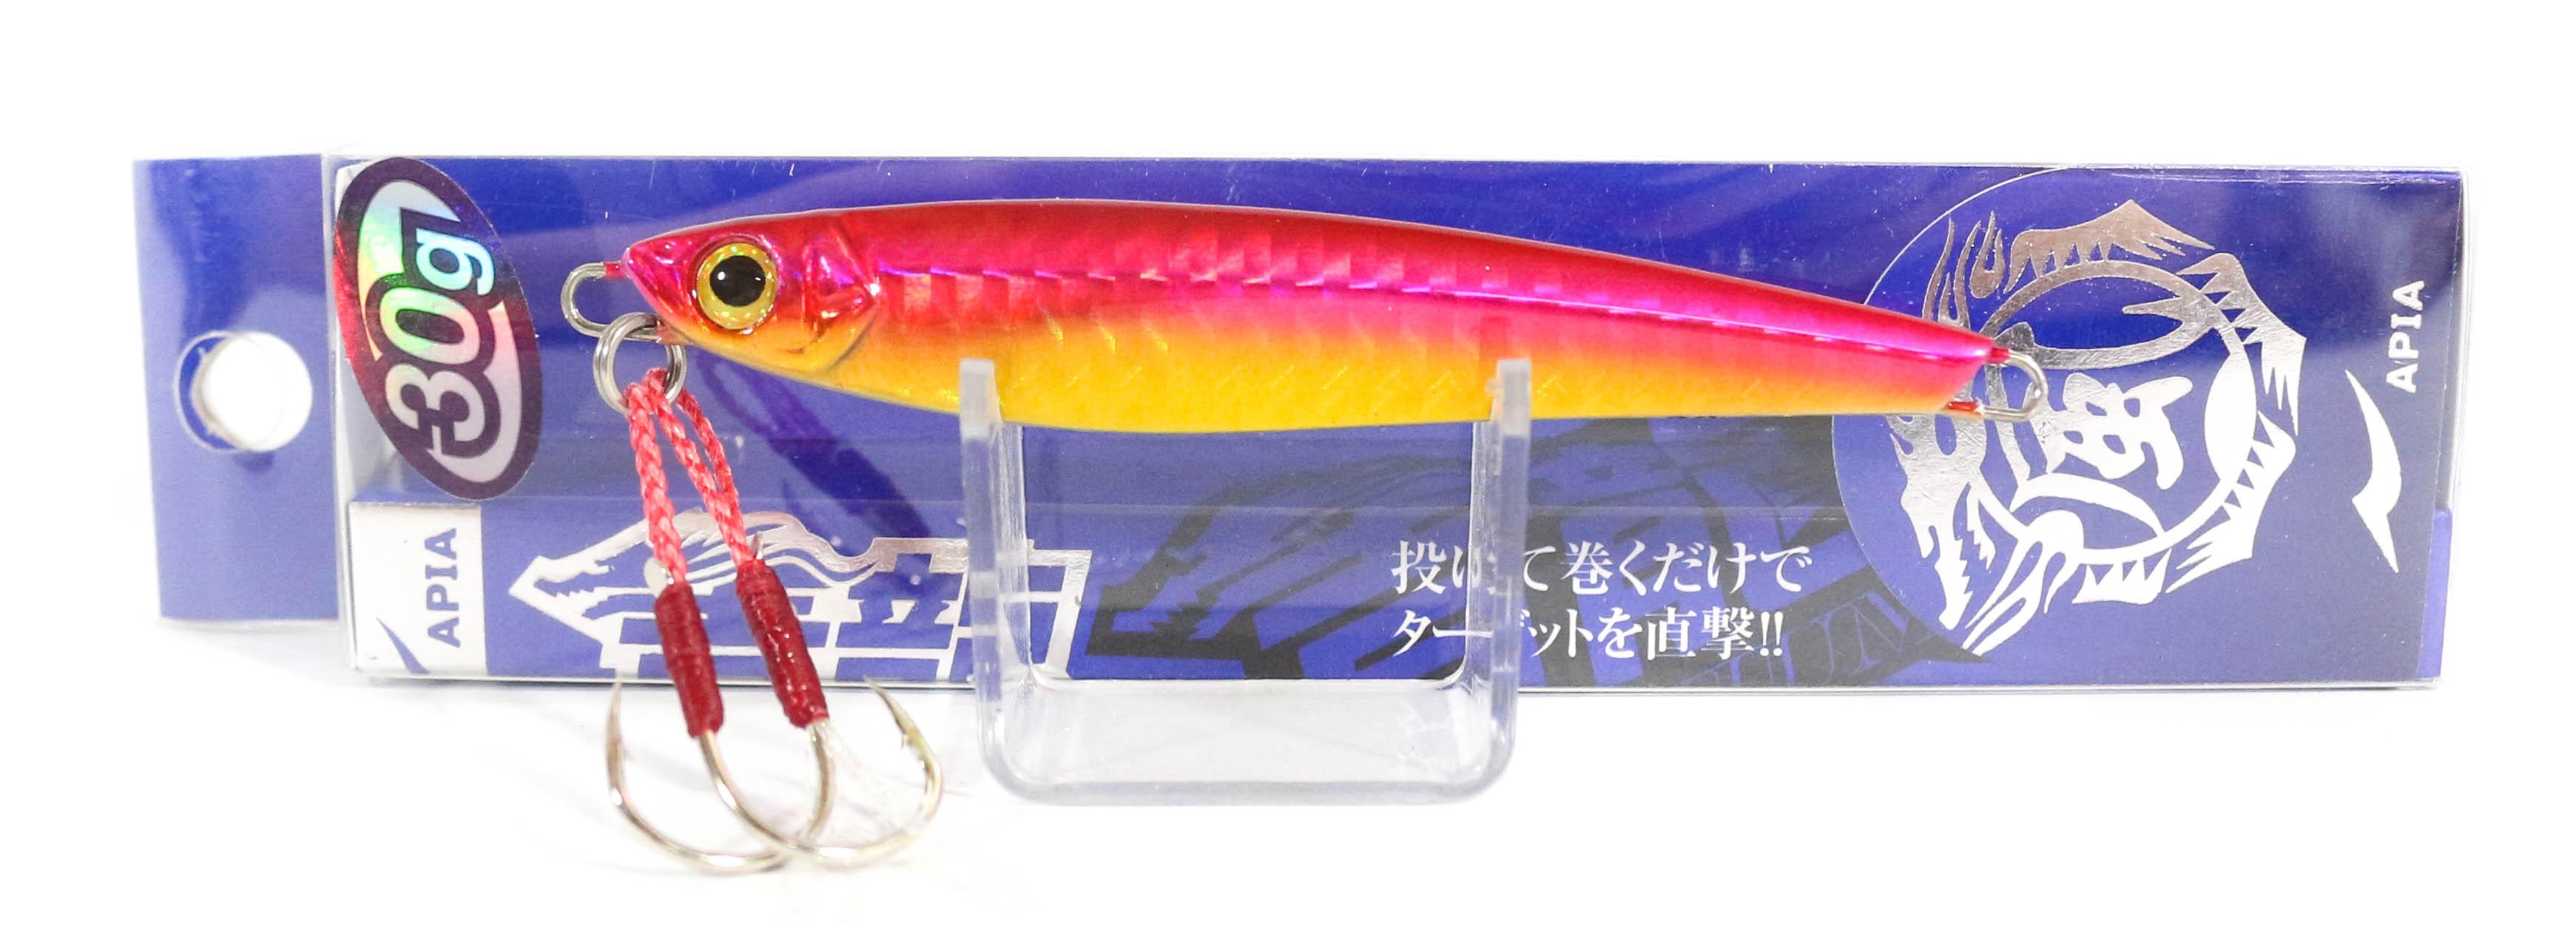 Sale Apia Metal Jig Seiryu Premium 30 Grams Sinking Lure 08 (3929)